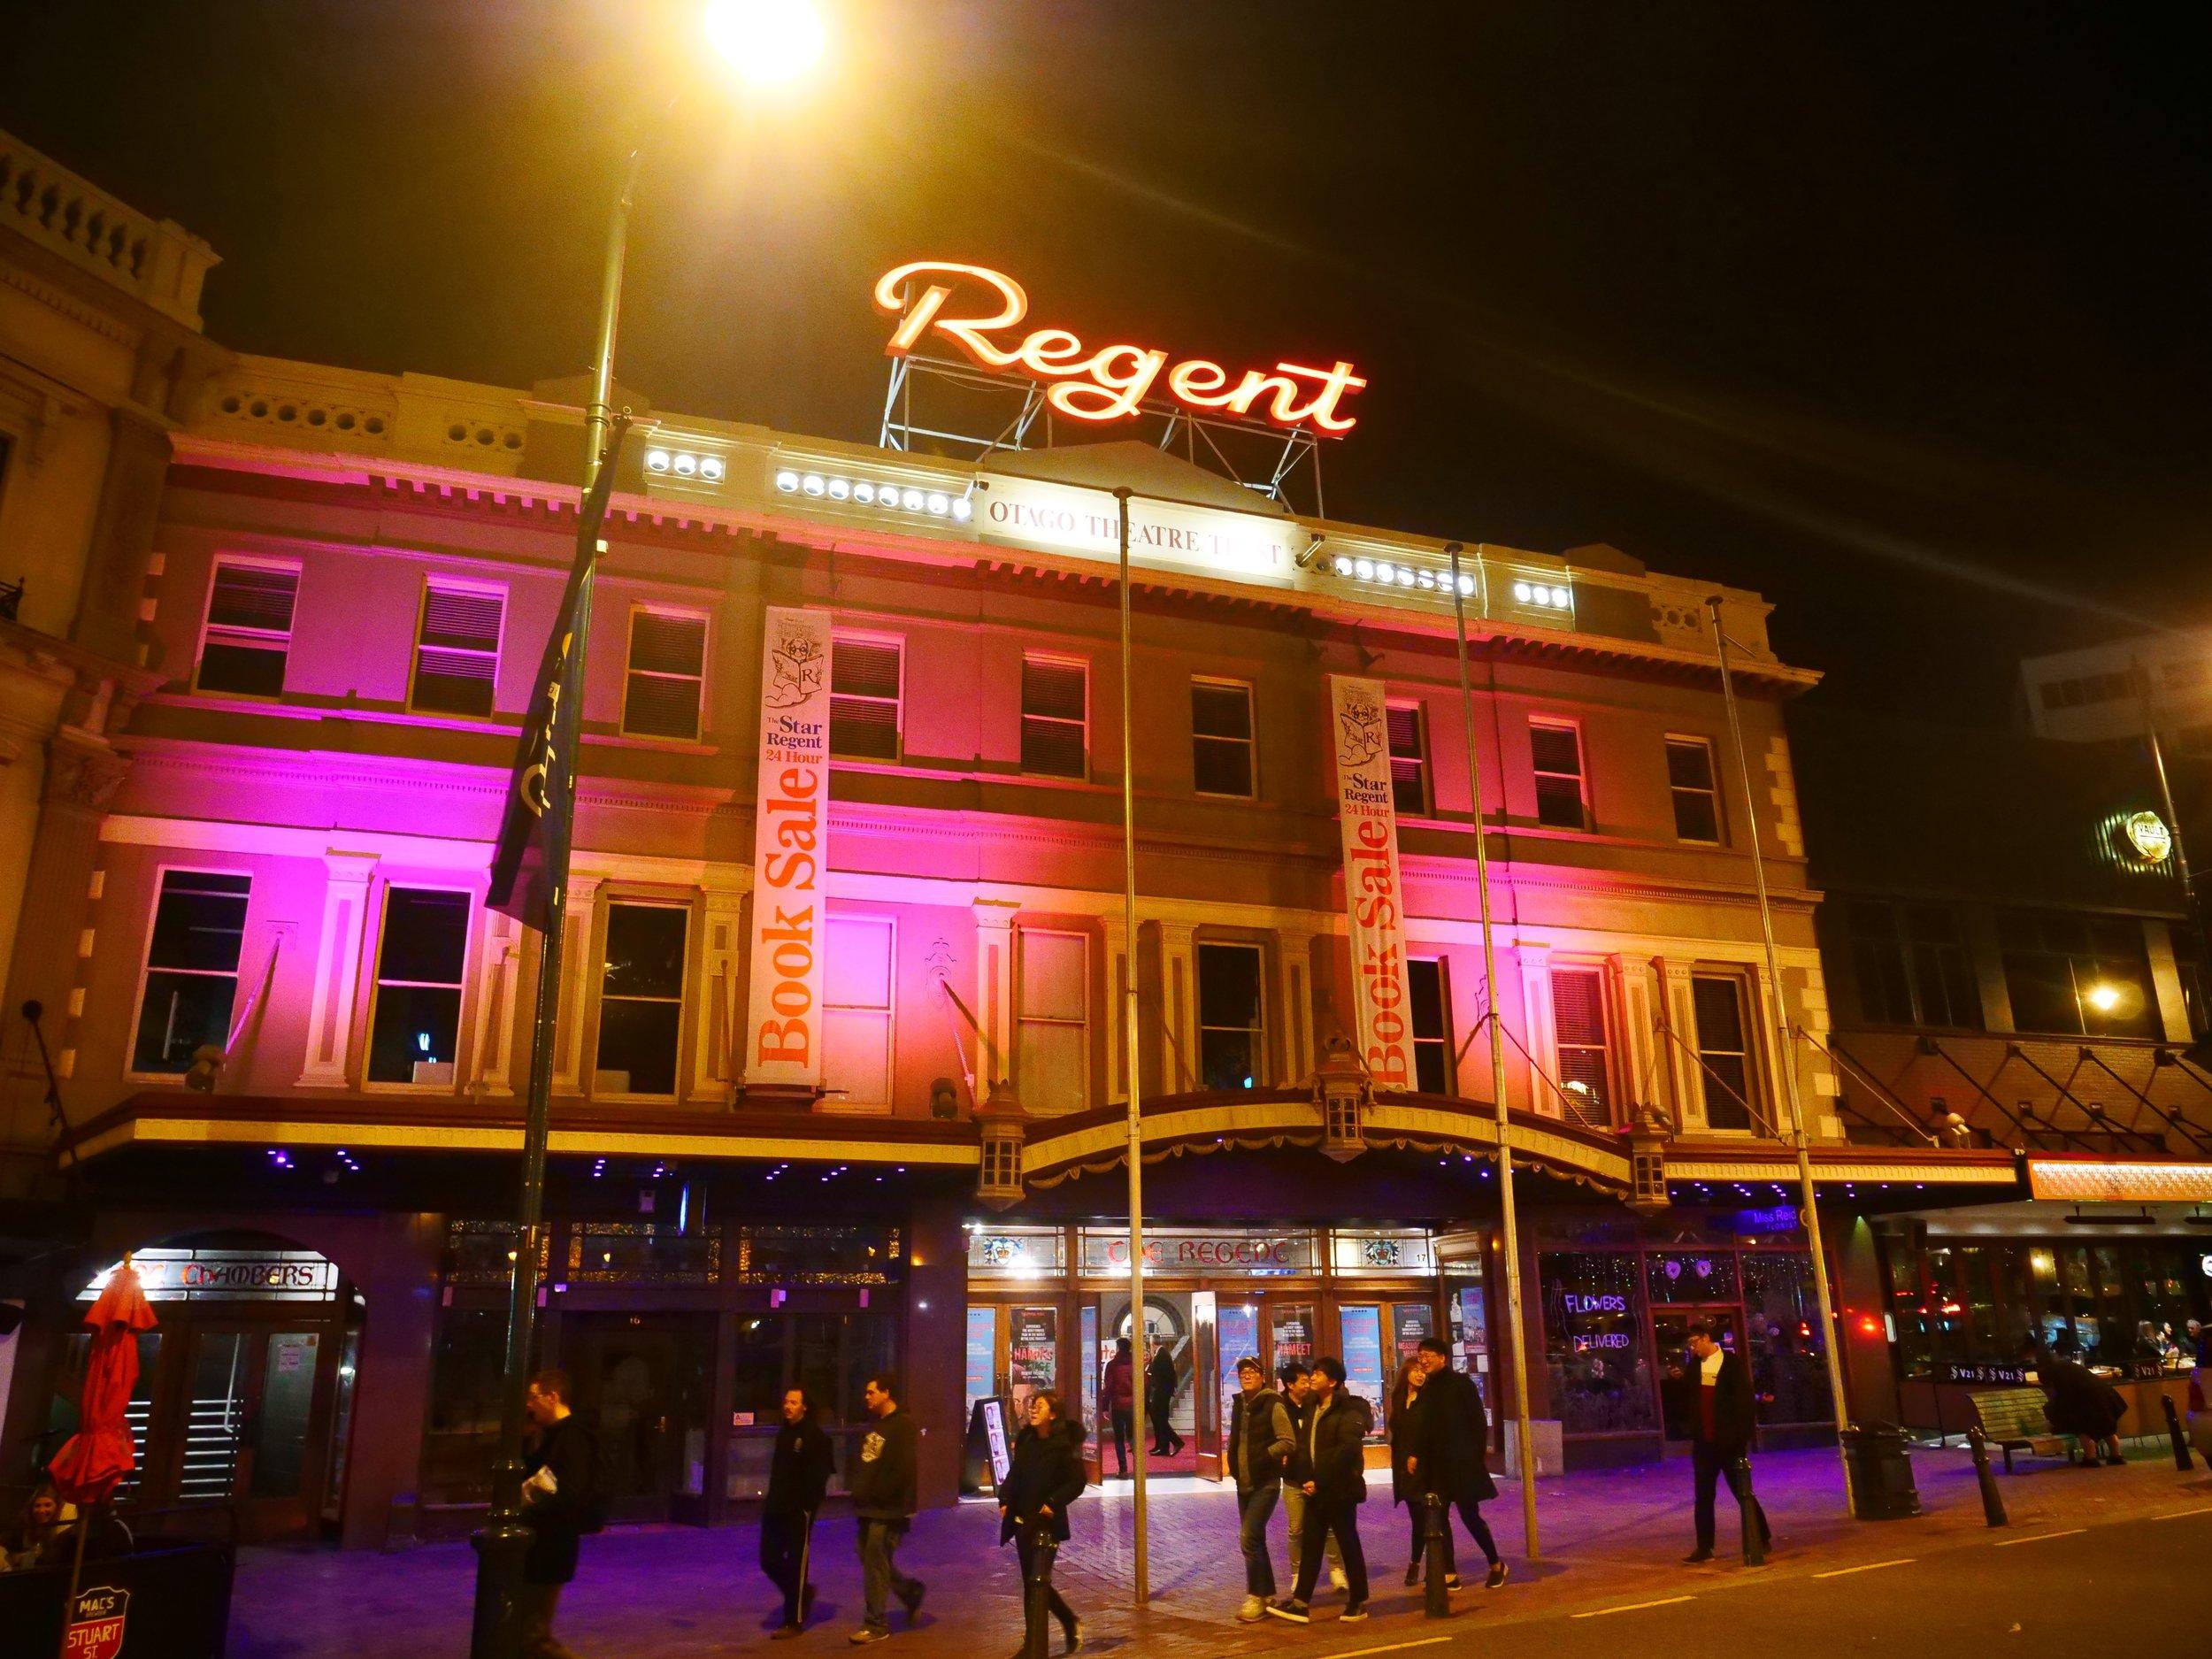 The Regent Theatre, Dunedin.